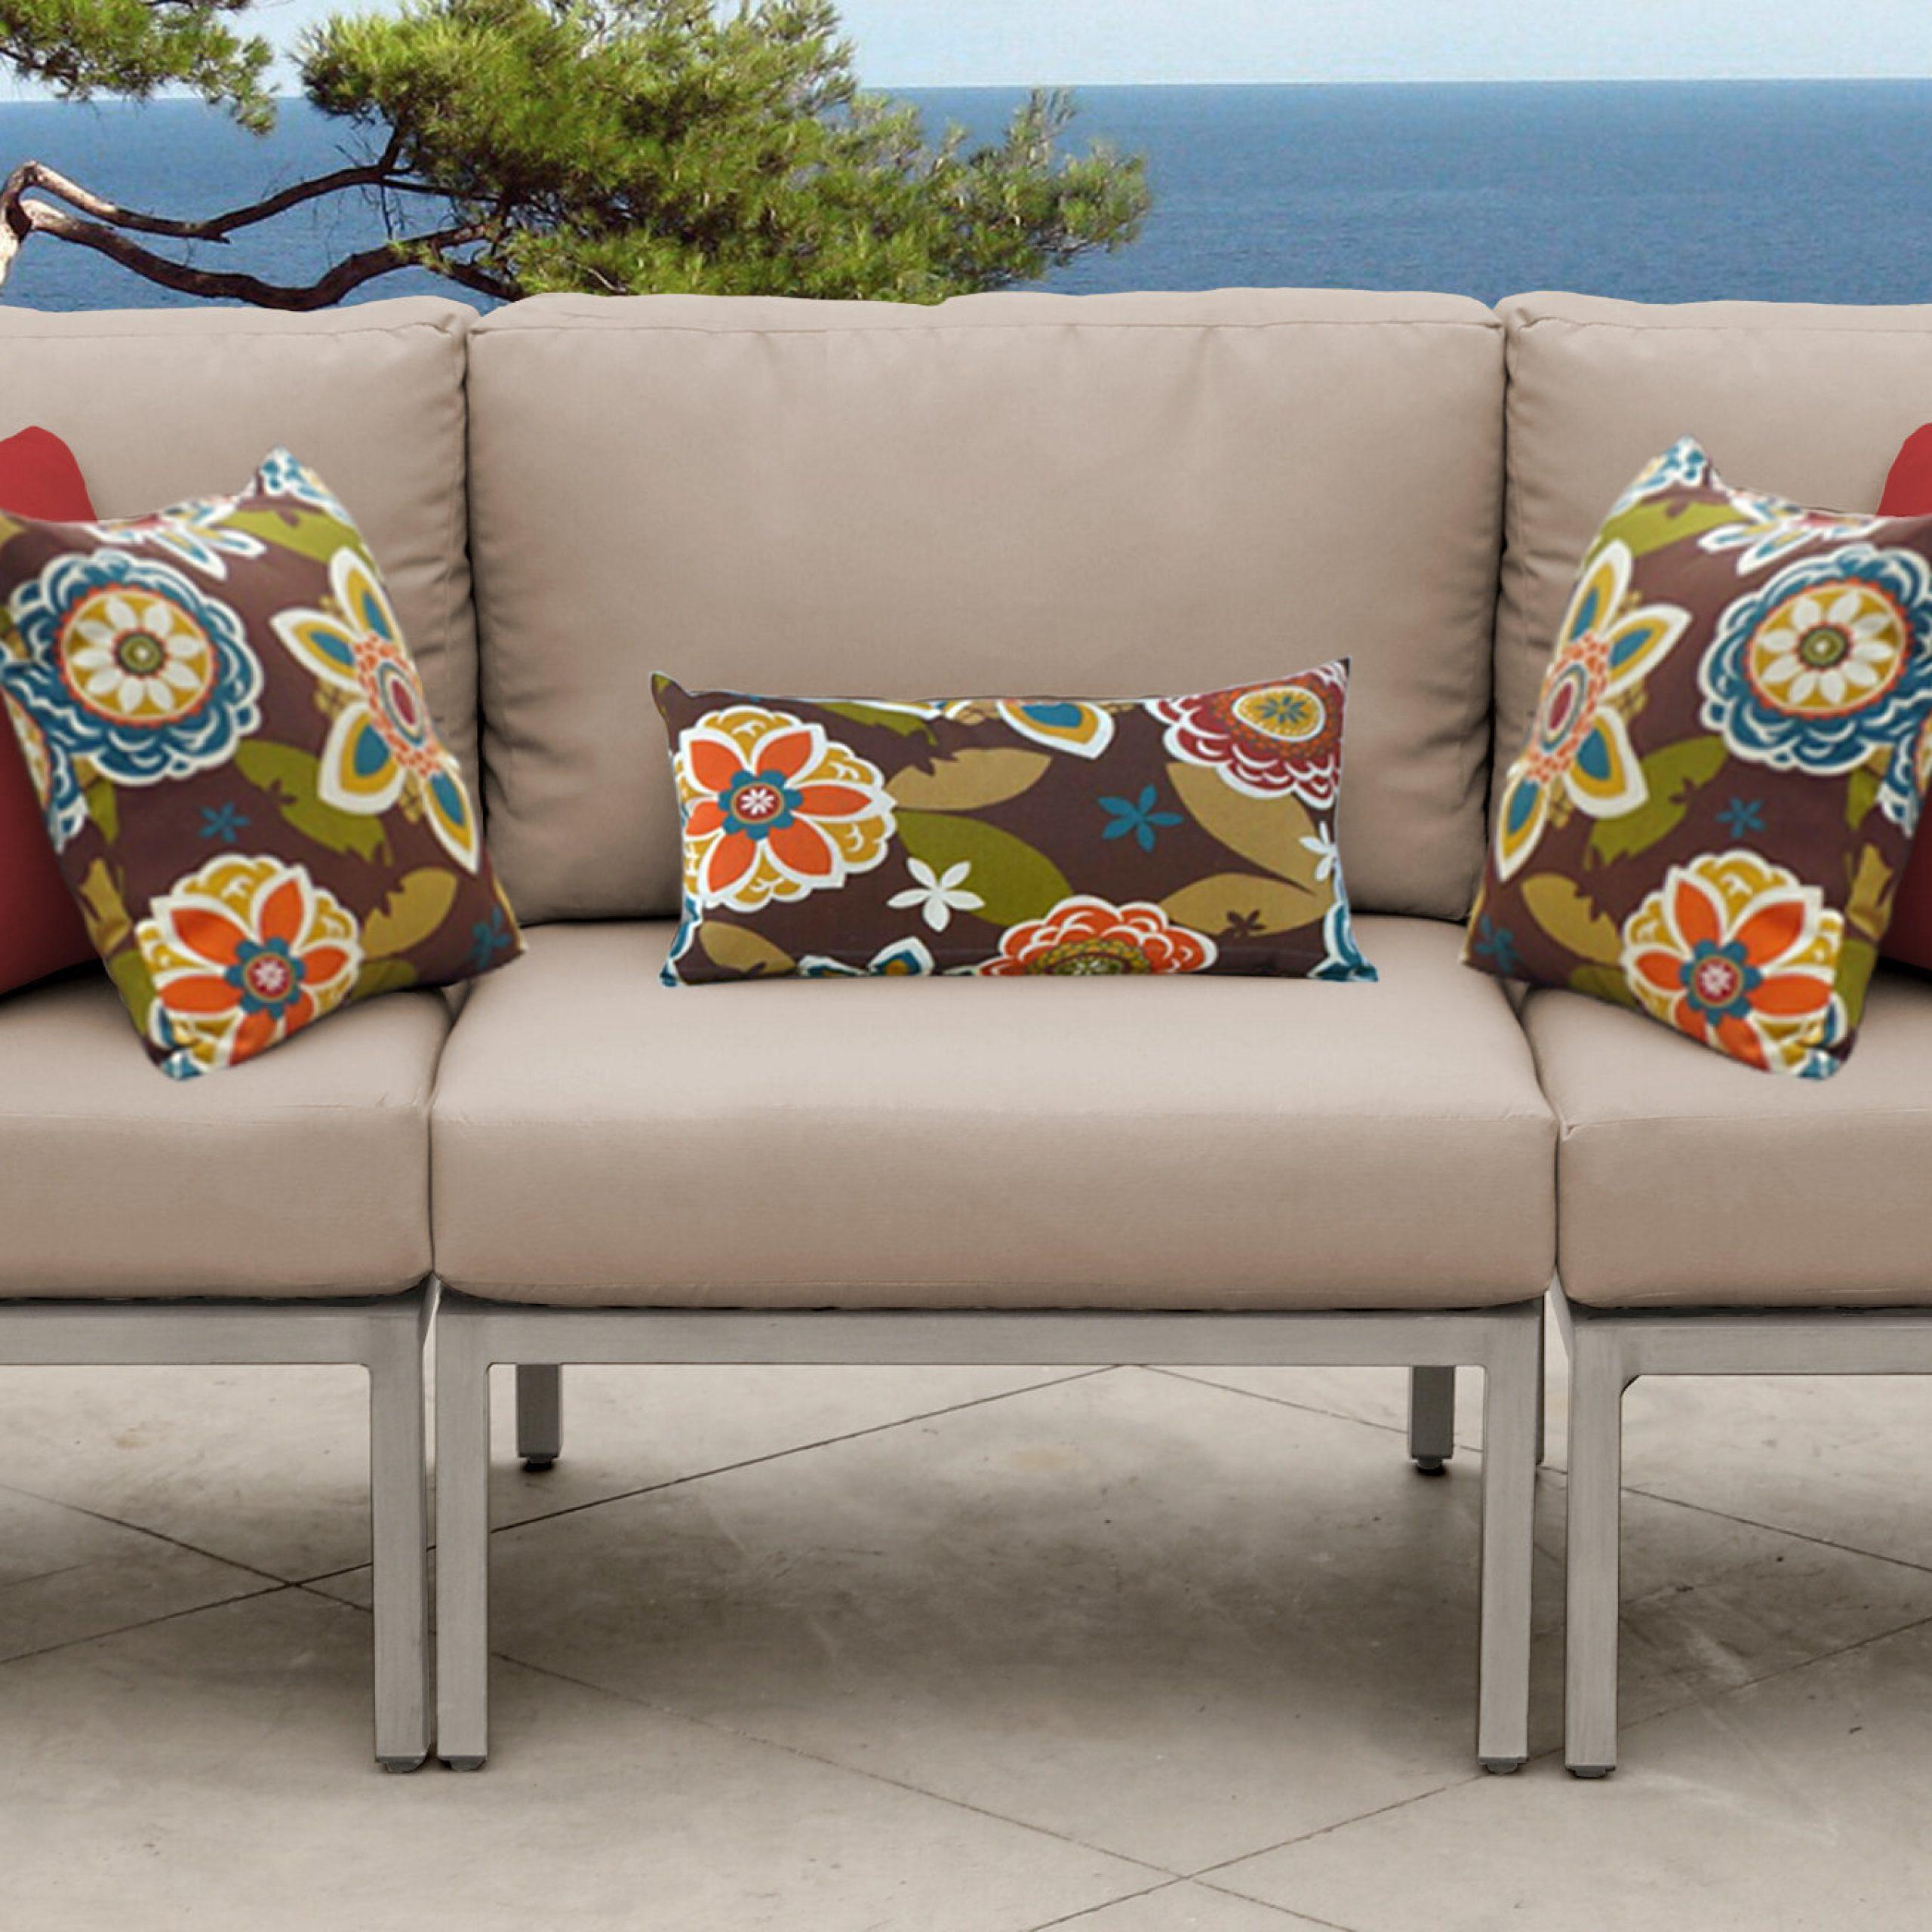 Famous Tk Classics Carlisle Patio Sofa With Cushions Pertaining To Carlisle Patio Sofas With Cushions (View 14 of 25)